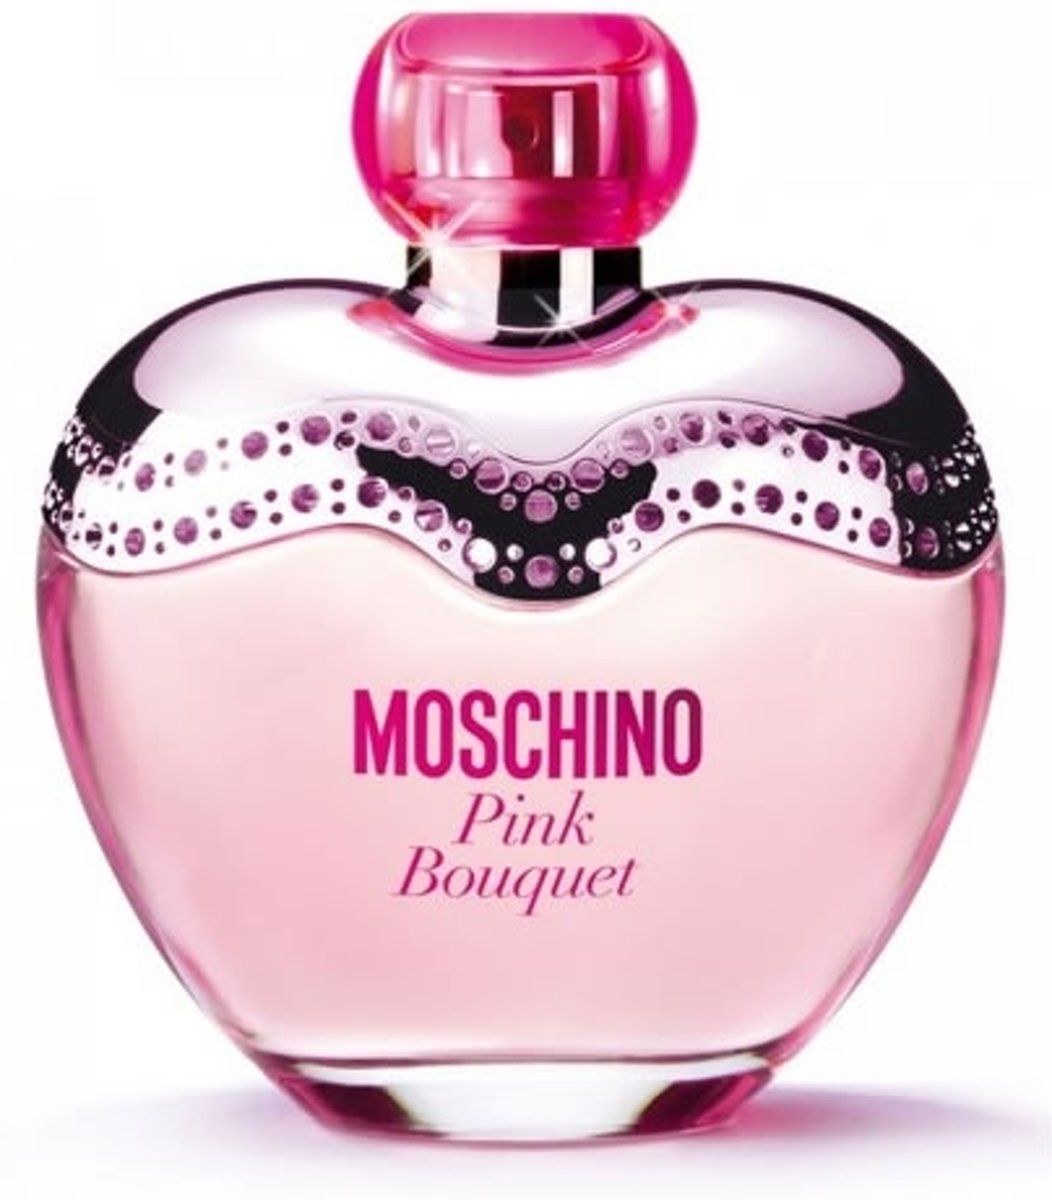 MULTI BUNDEL 3 stuks Moschino Pink Bouquet Eau De Toilette Spray 30ml kopen